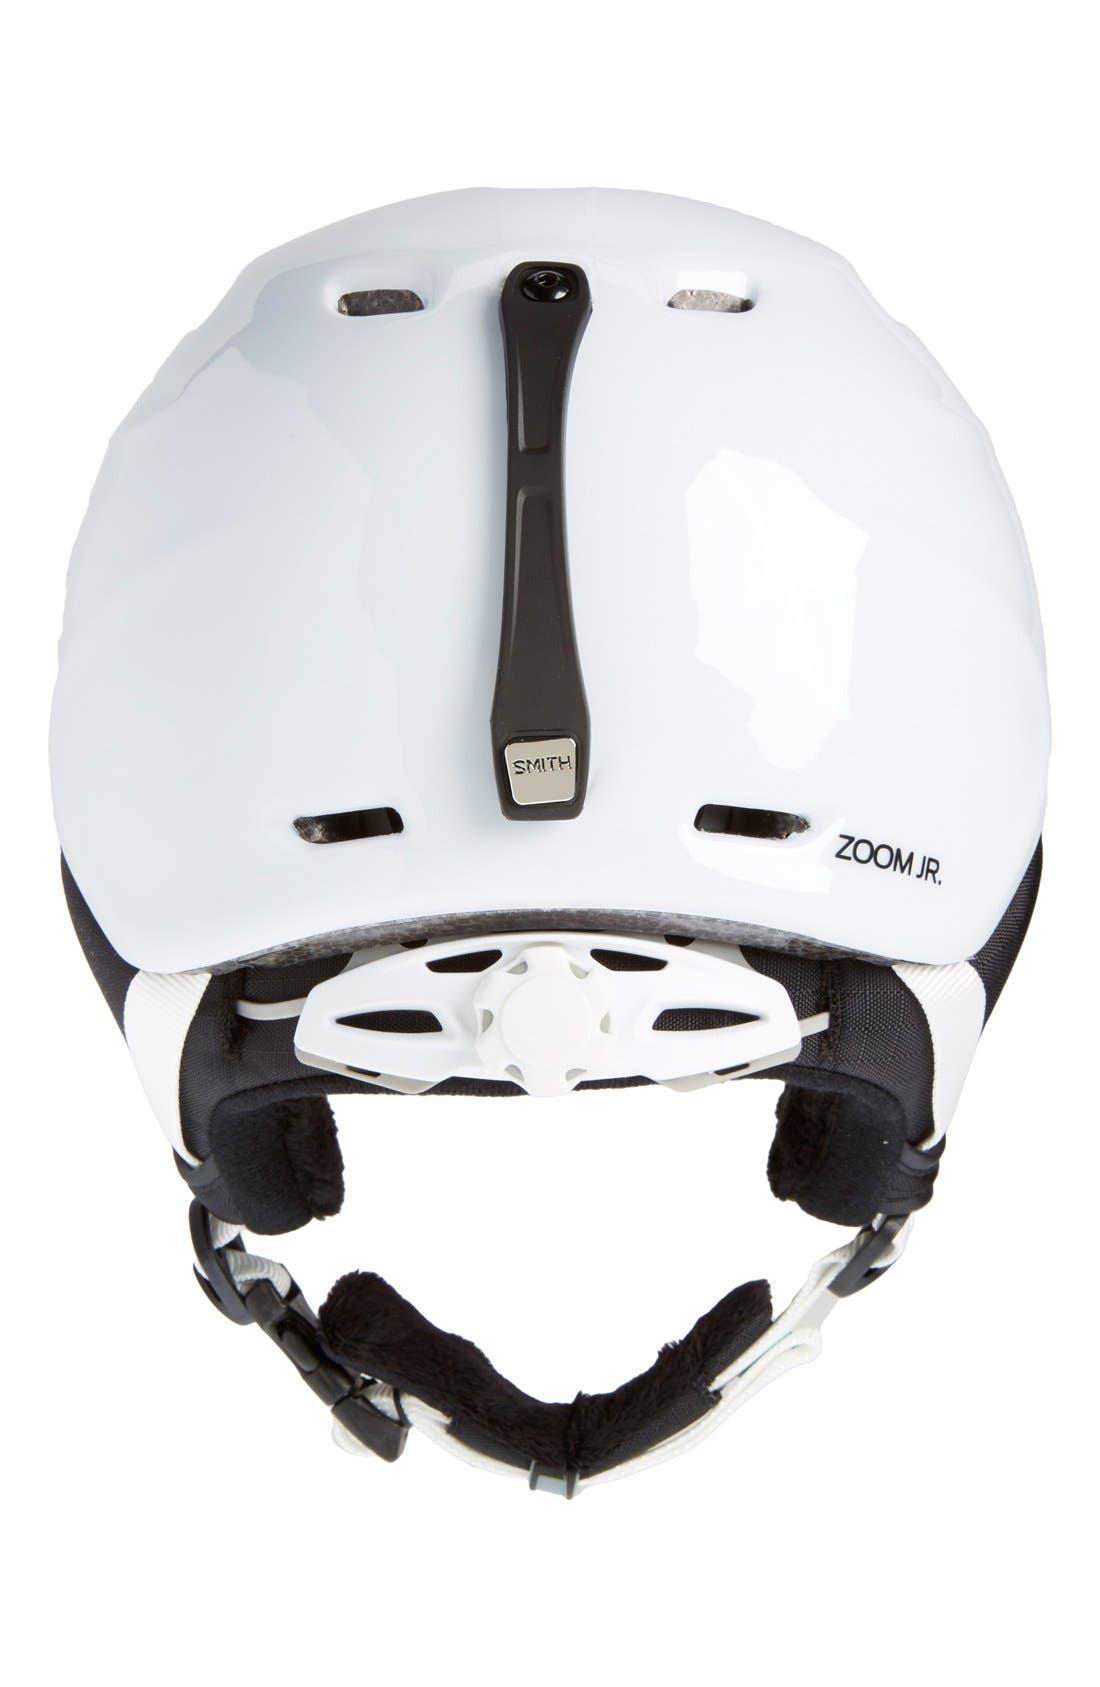 Alternate Image 2  - Smith 'Zoom Jr.' Snow Helmet (Juniors)